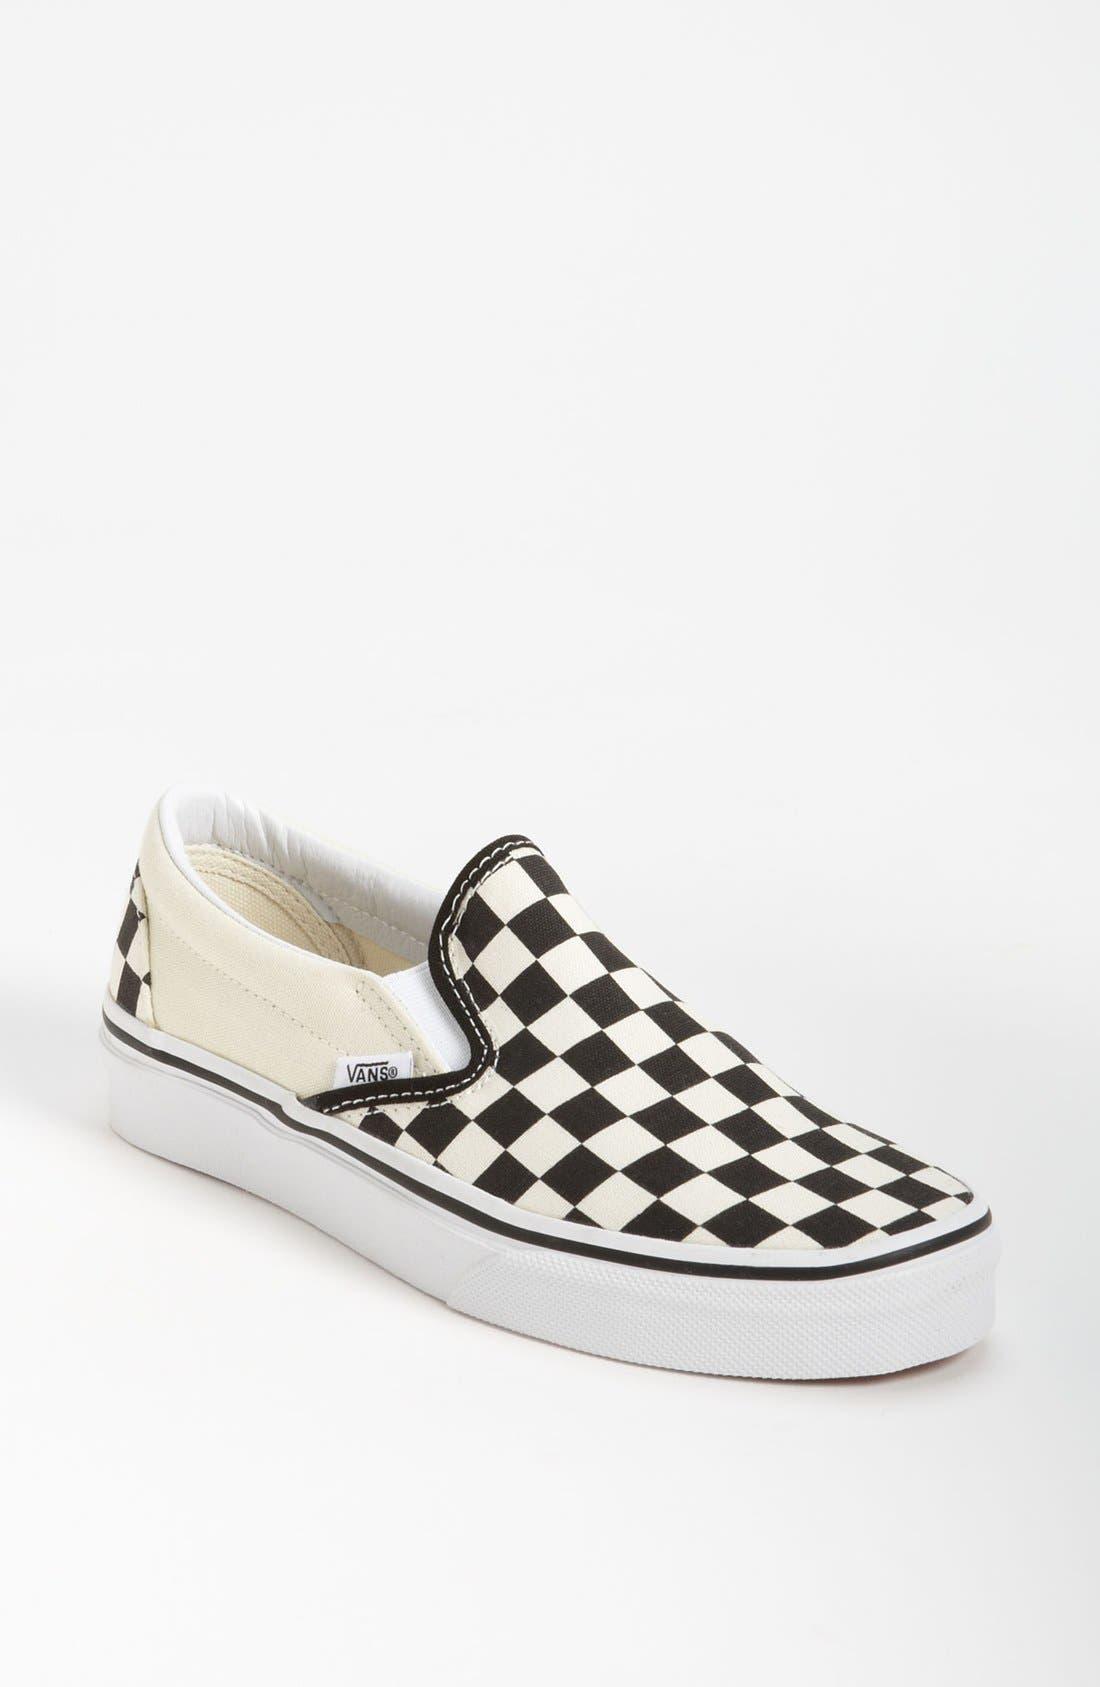 Alternate Image 1 Selected - Vans 'Classic' Checkerboard Sneaker (Women)